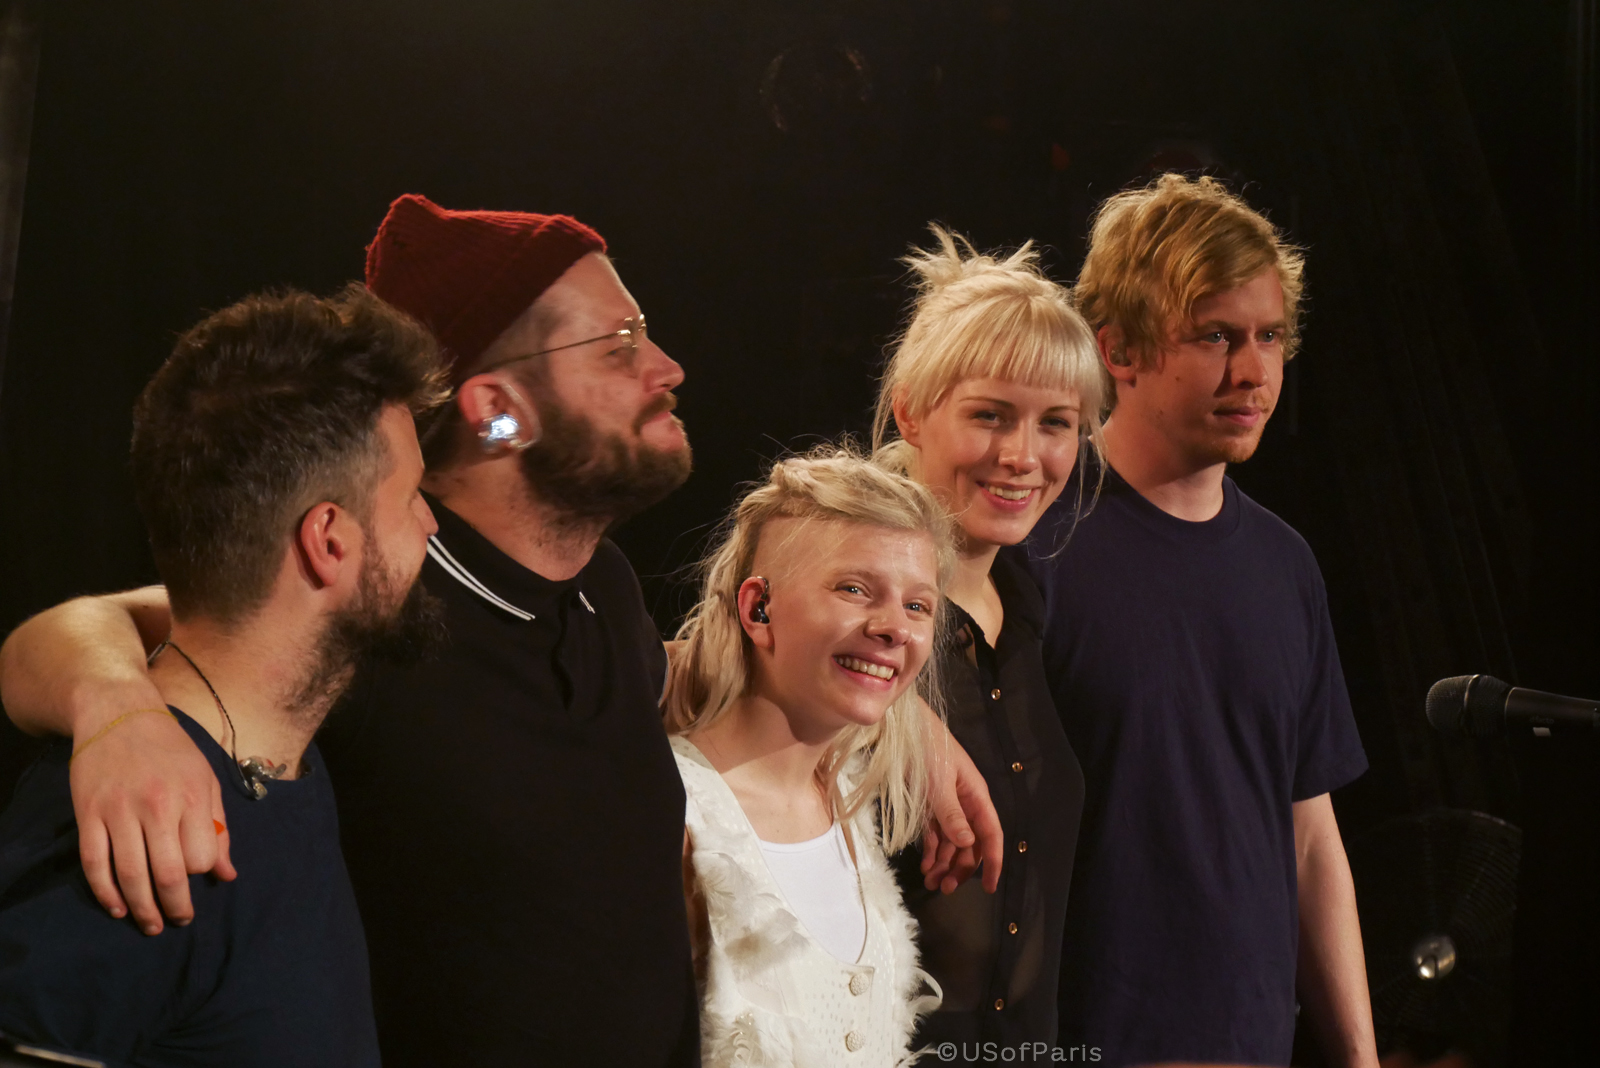 aurora-music-singer-smile-with-her-band-magnus-skylstad-concert-live-paris-stage-photo-usofparis-blog